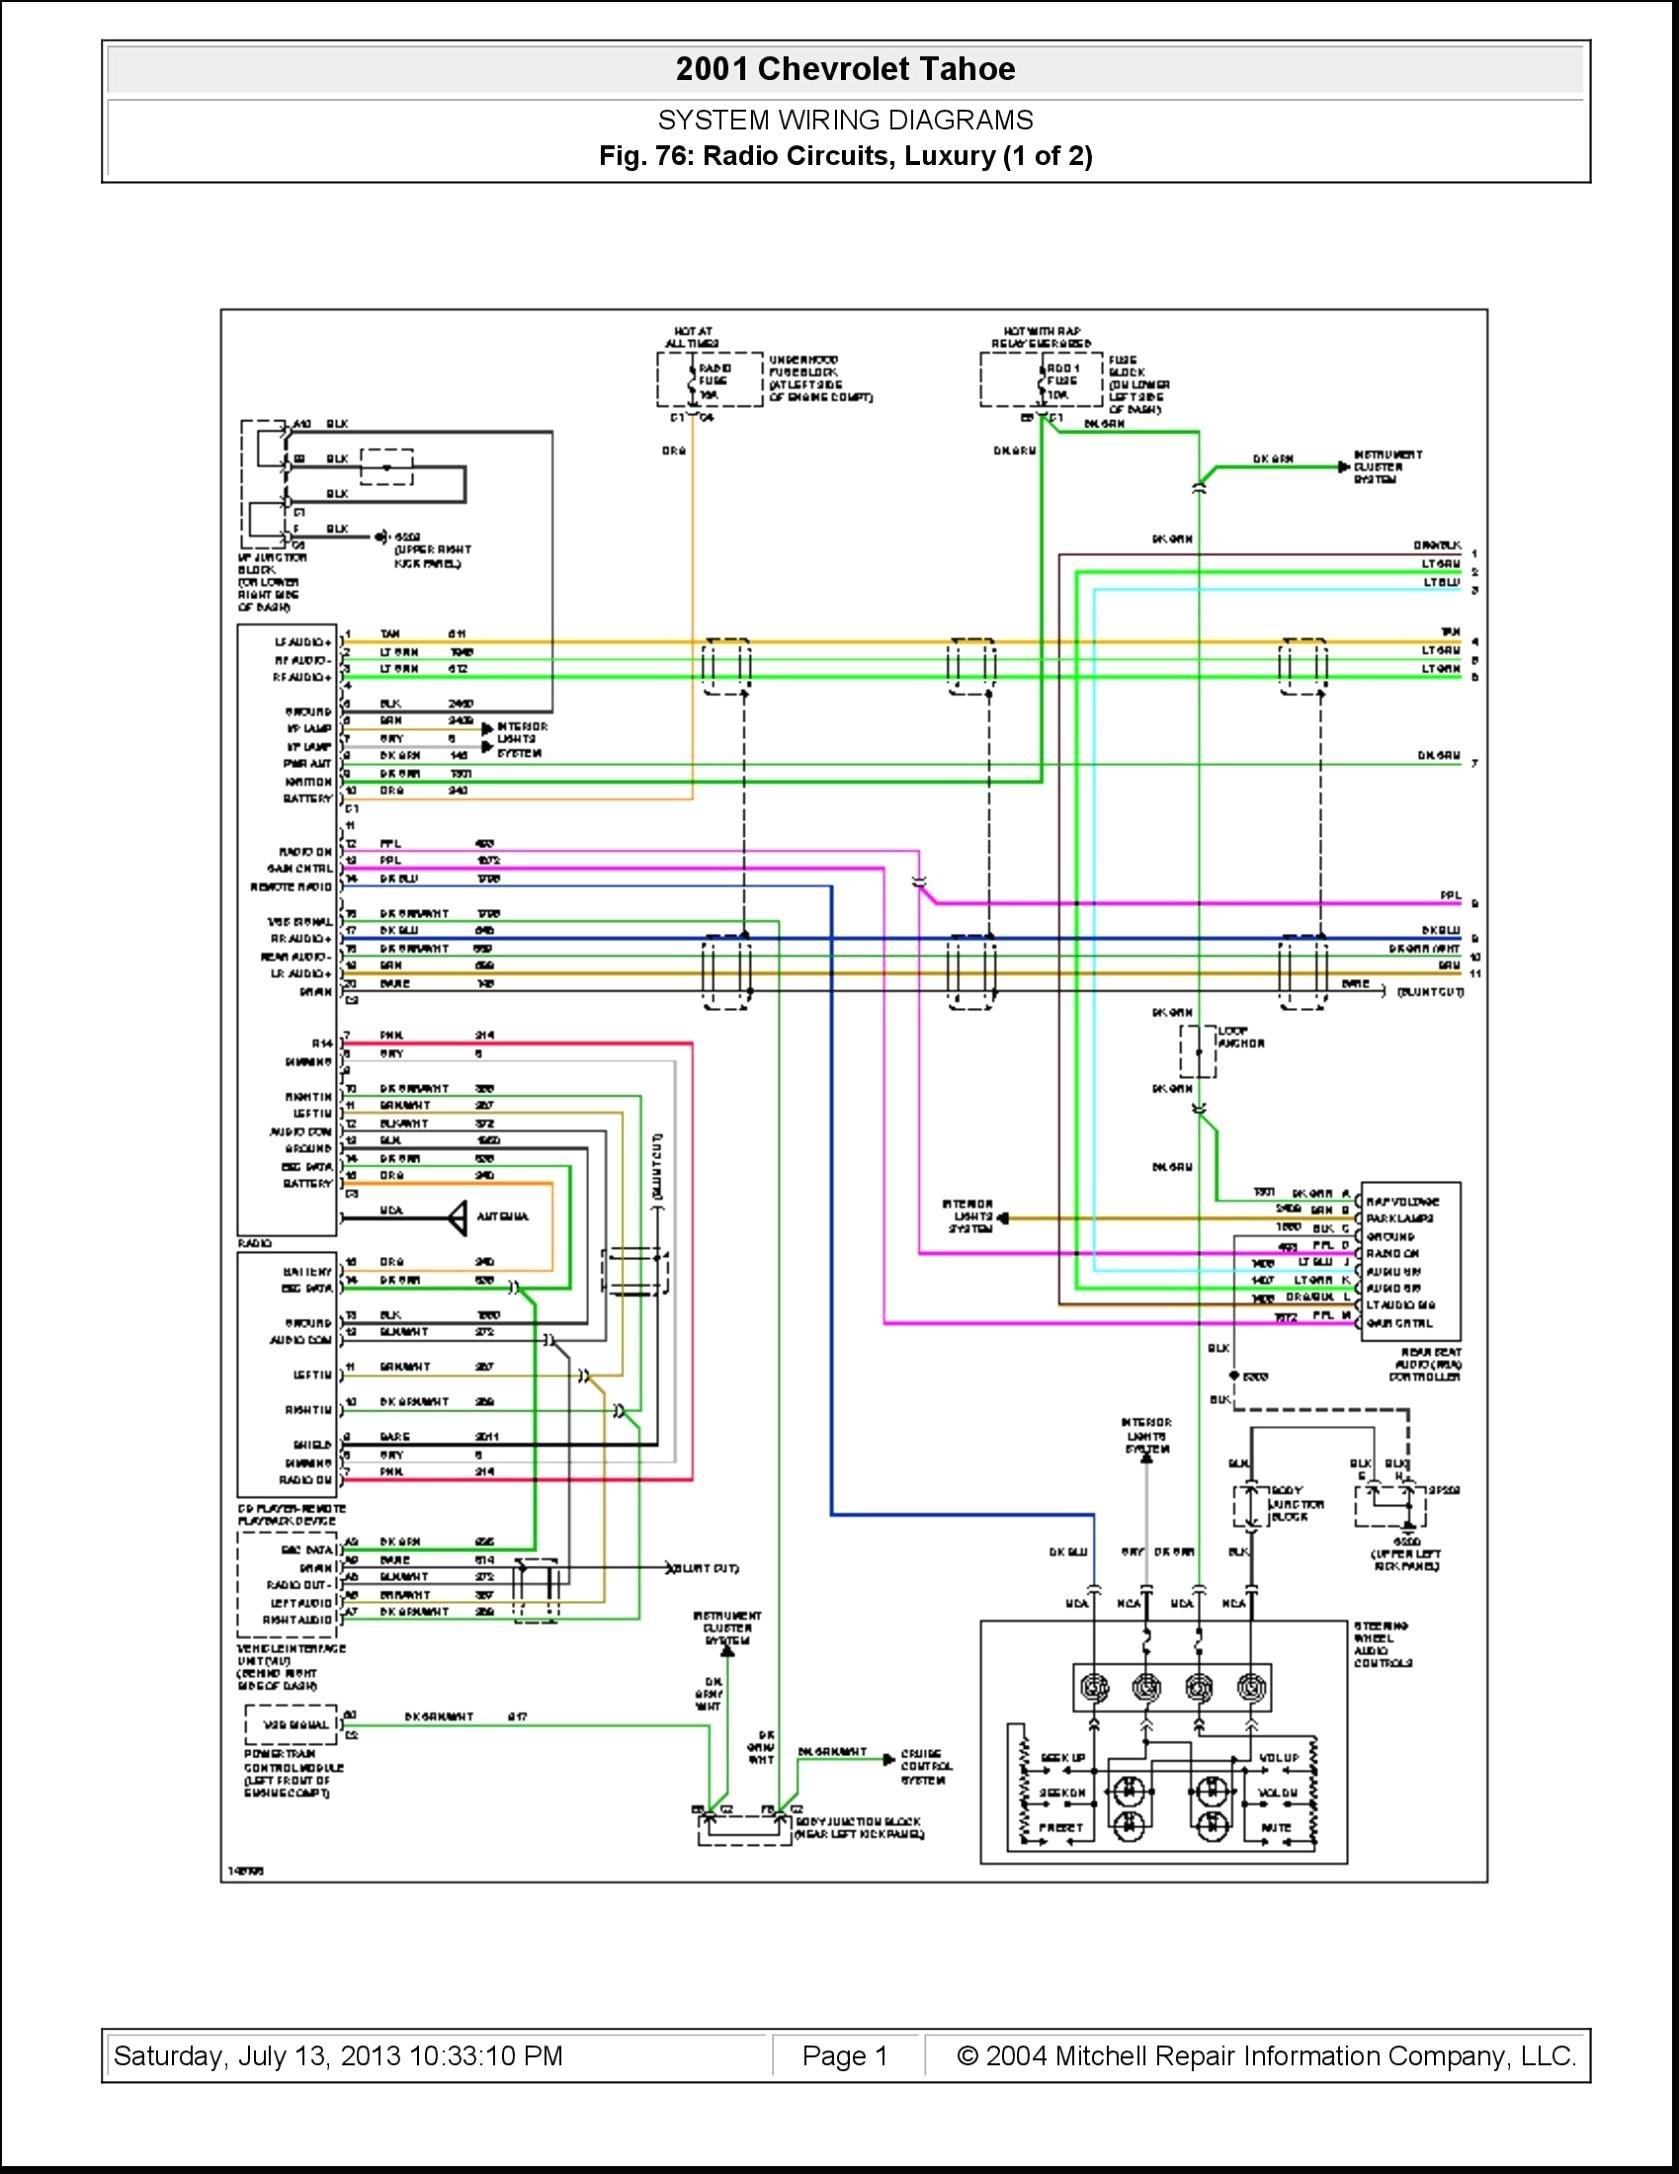 2014 Chevy Cruze Engine Diagram : chevy, cruze, engine, diagram, Wiring, Diagram, Chevy, Cruze, Database, Rotation, Arch-depart, Arch-depart.ciaodiscotecaitaliana.it